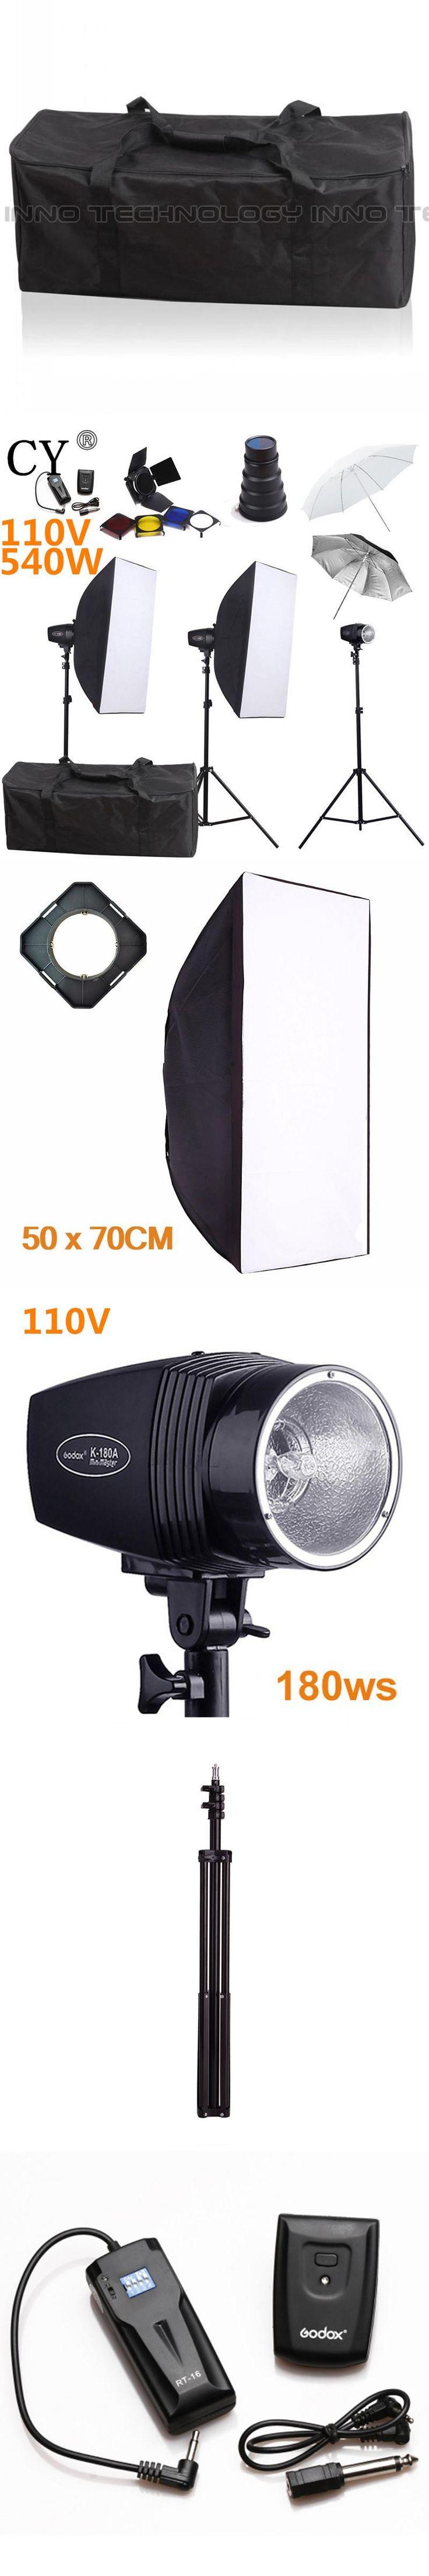 CY Photography Studio Flash Softb Box Lighting Kits 540w 110V Storbe Softbox Stand Umbrella Photo Studio Equipments Godox K-180A